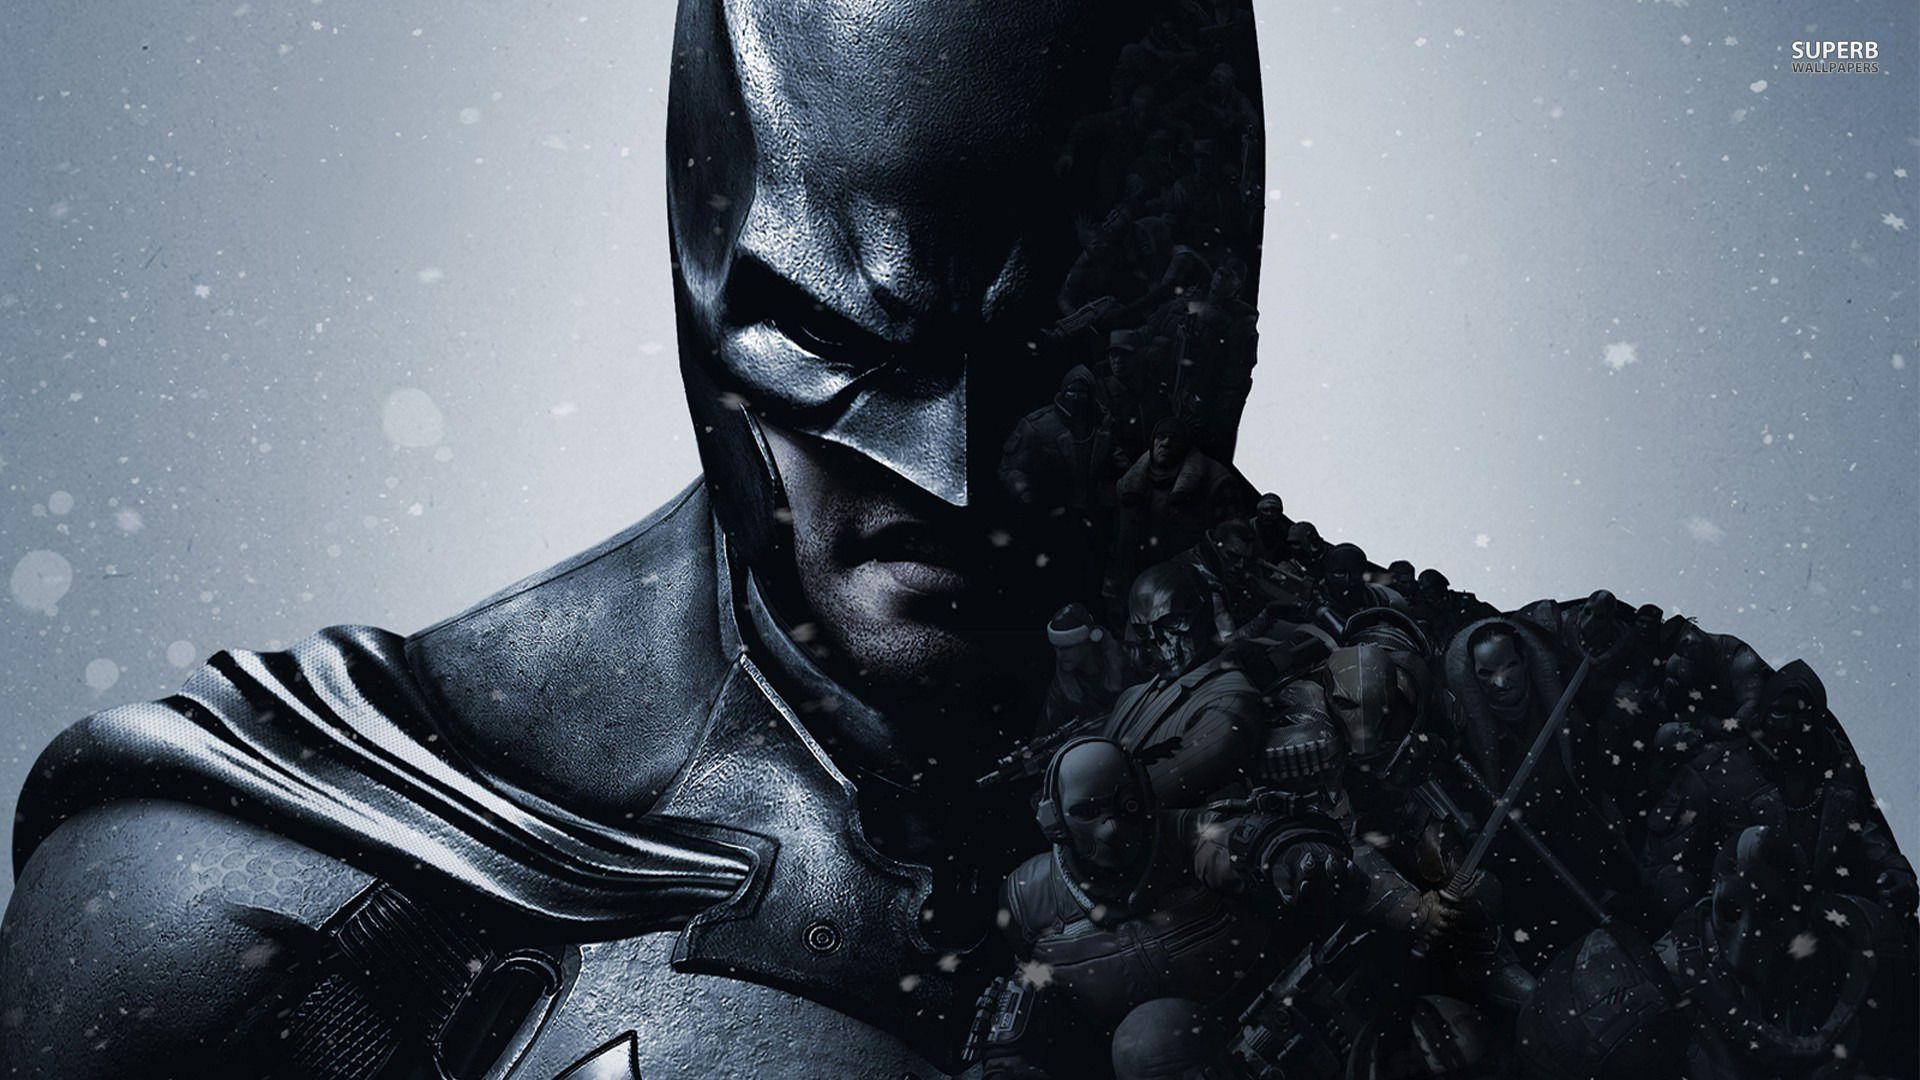 Batman Arkham Origins Wallpaper Hd Iphone2lovely